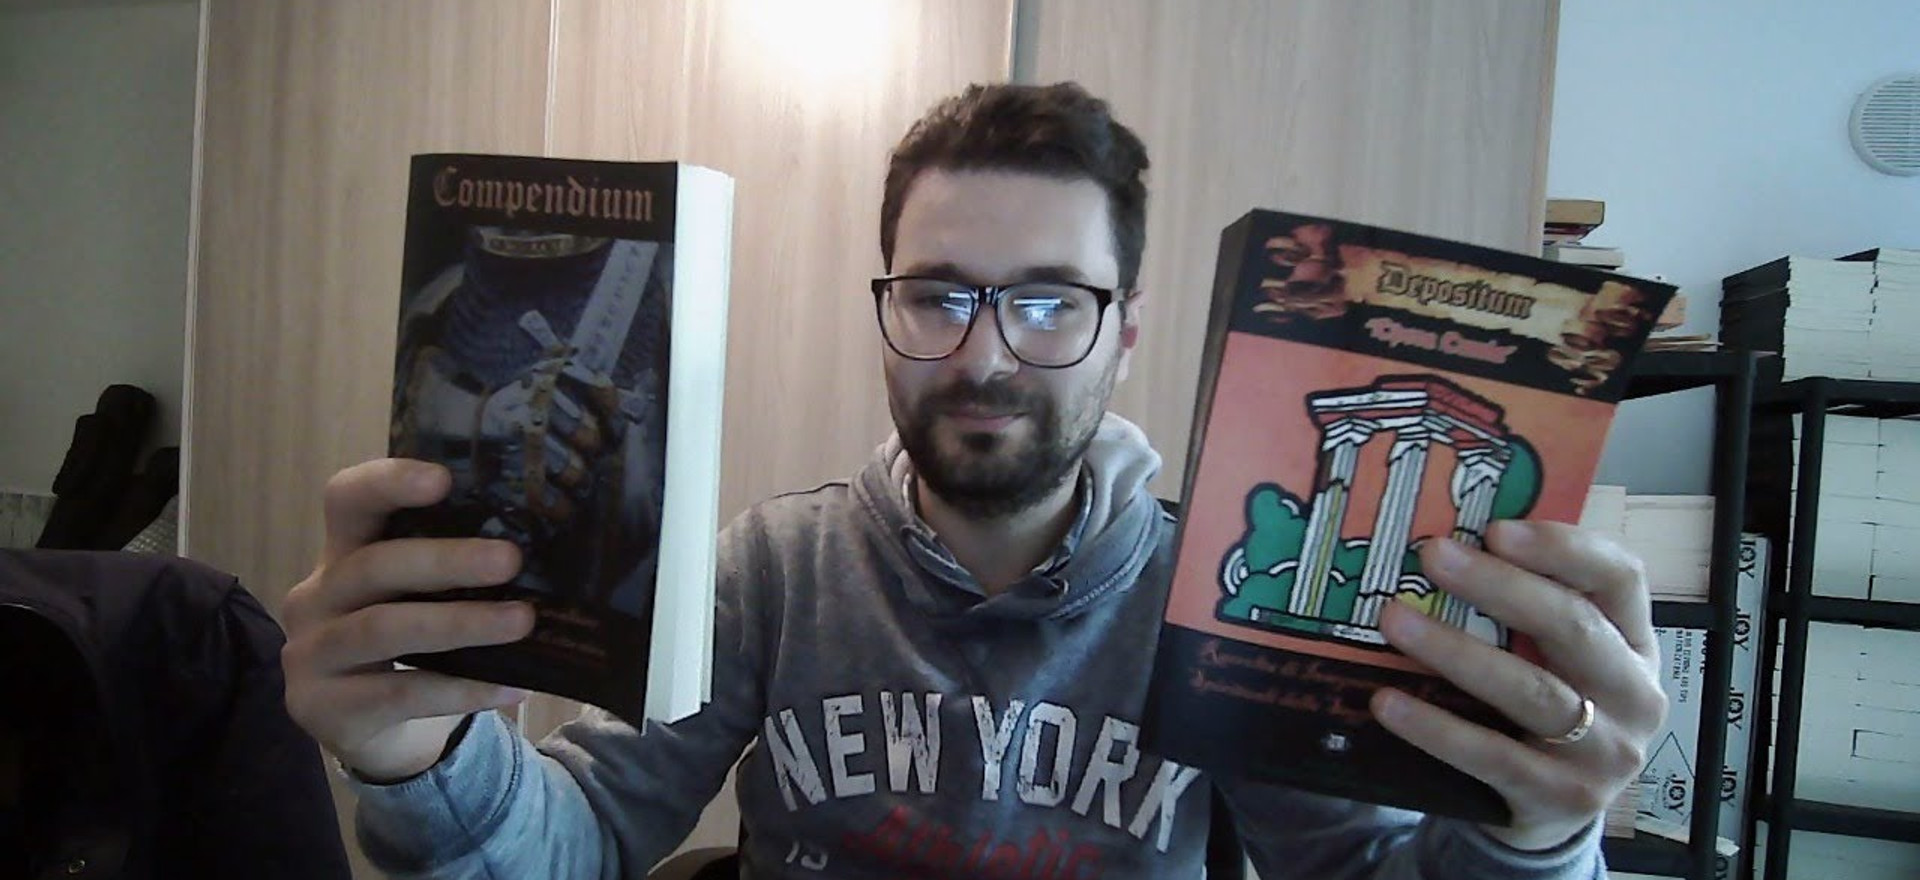 Video di Presentazione Depositum e Compendium